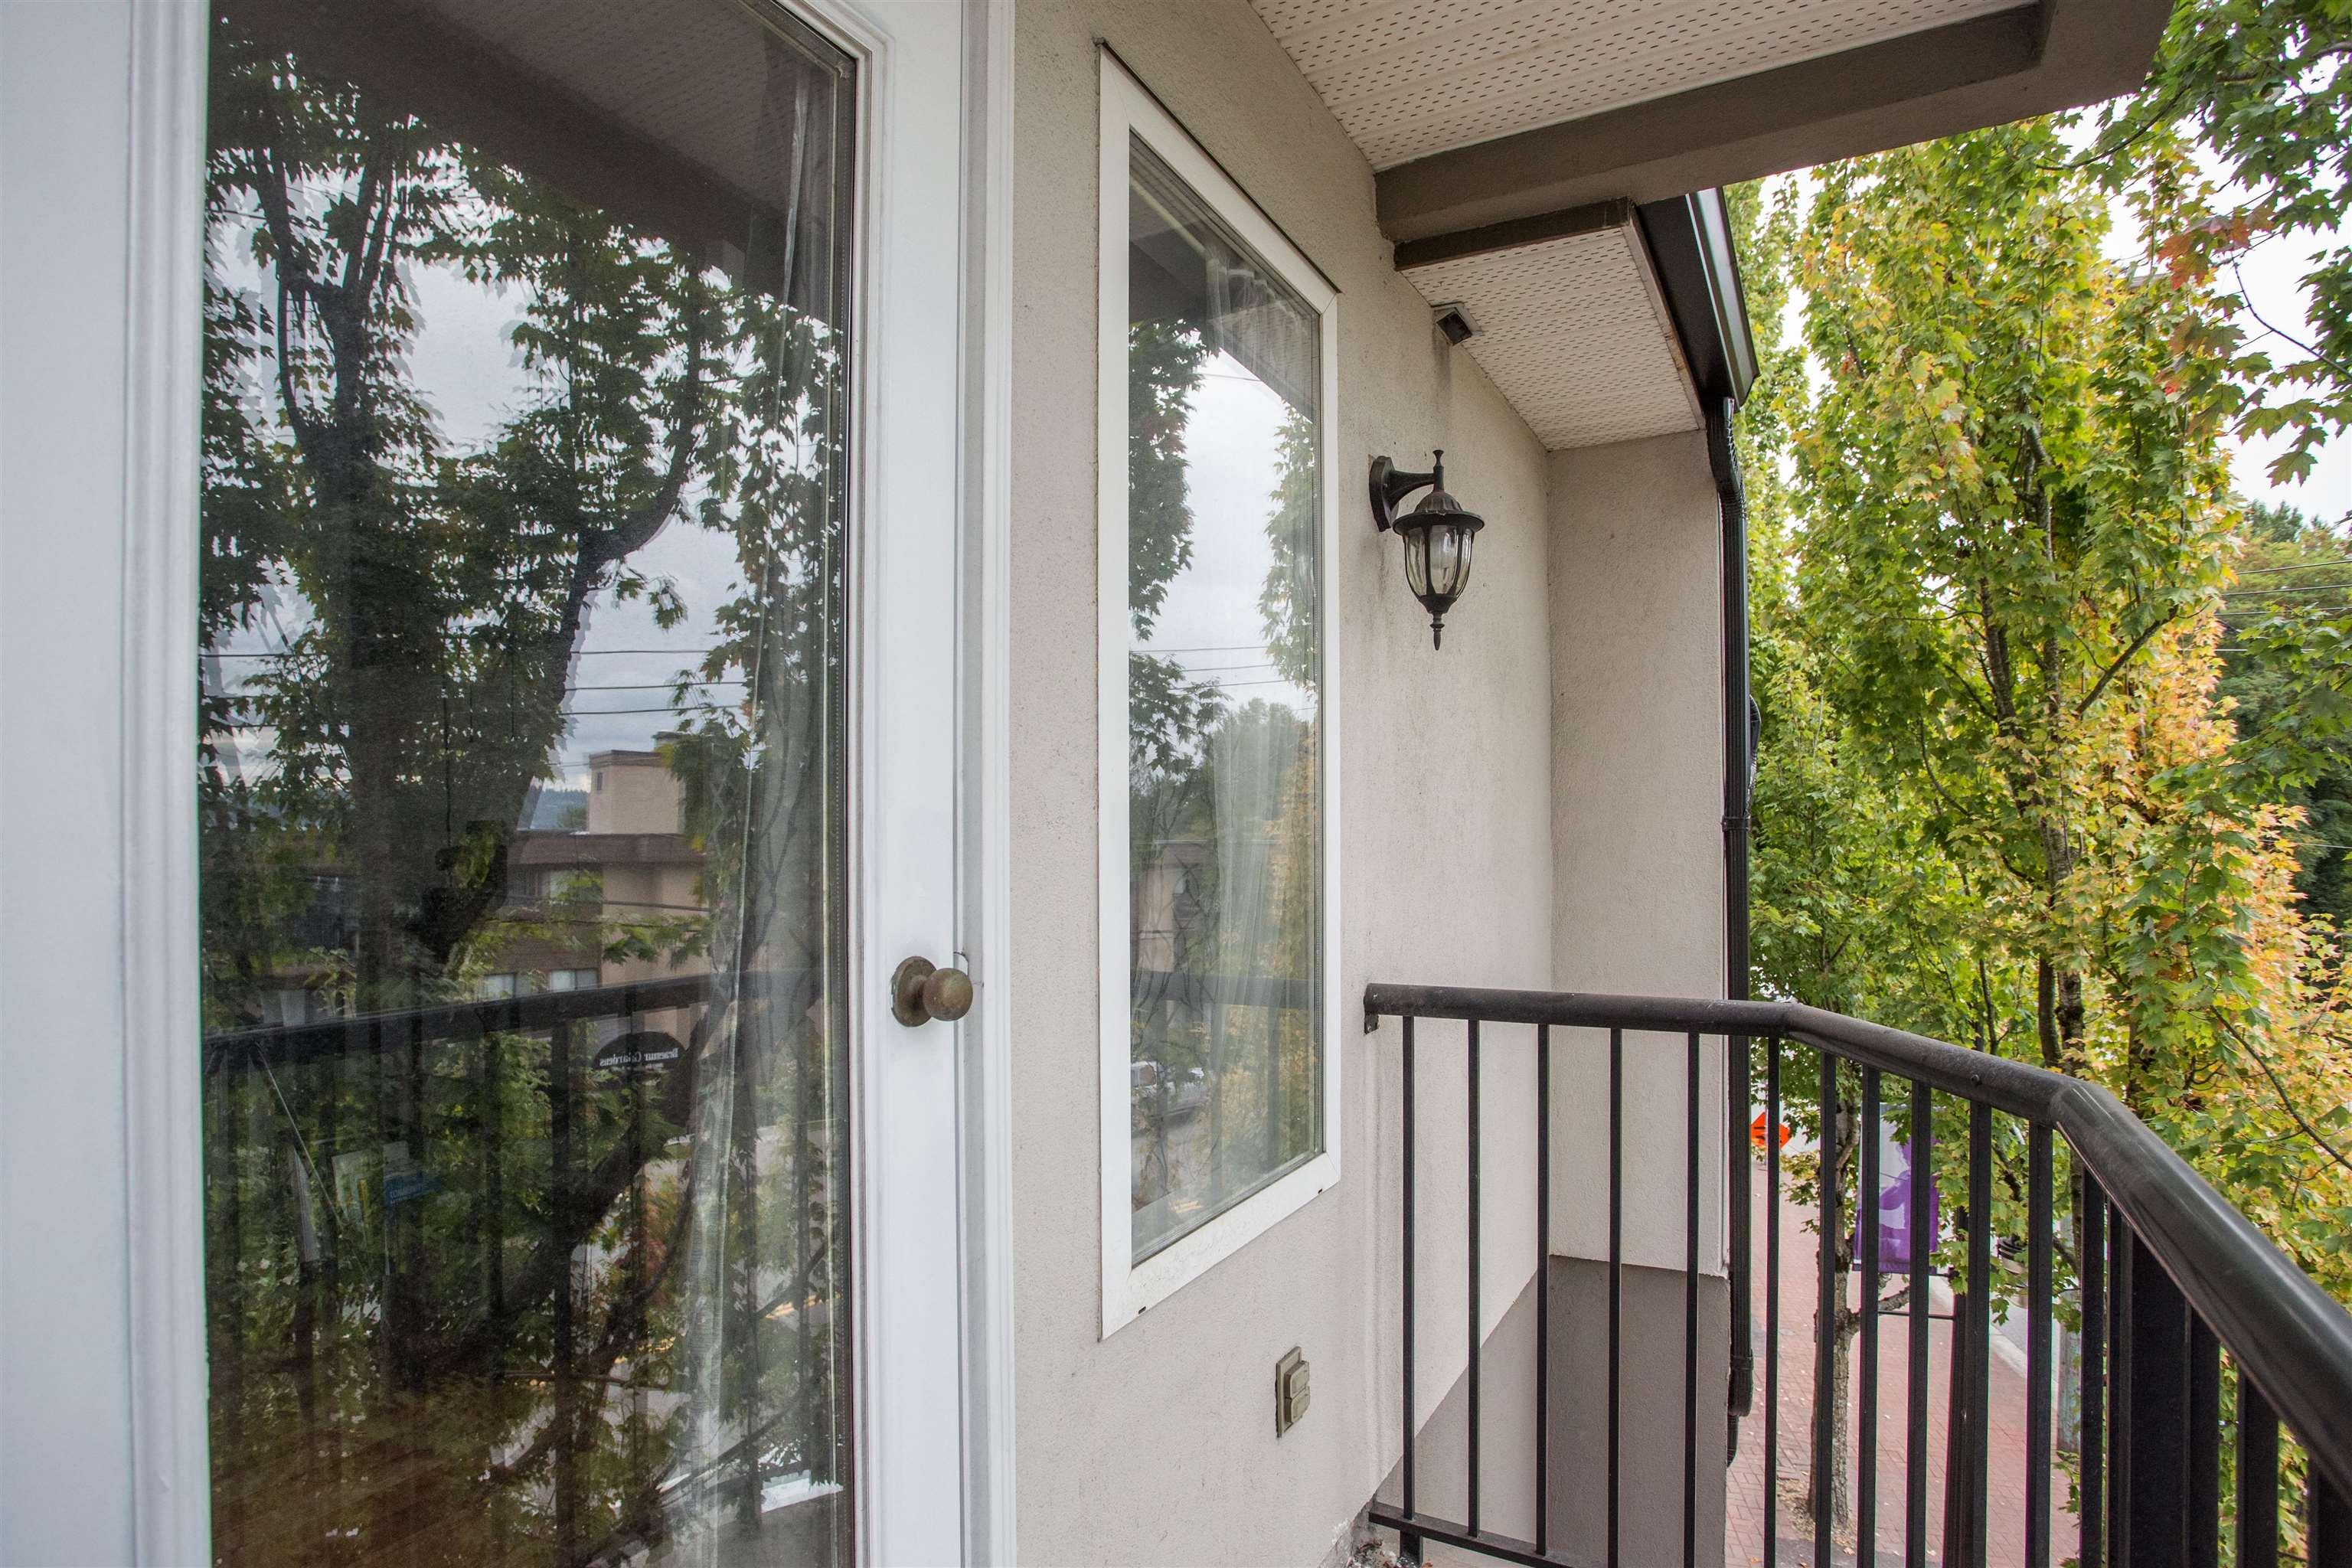 7 205 LEBLEU STREET - Maillardville Apartment/Condo for sale, 3 Bedrooms (R2625671) - #8